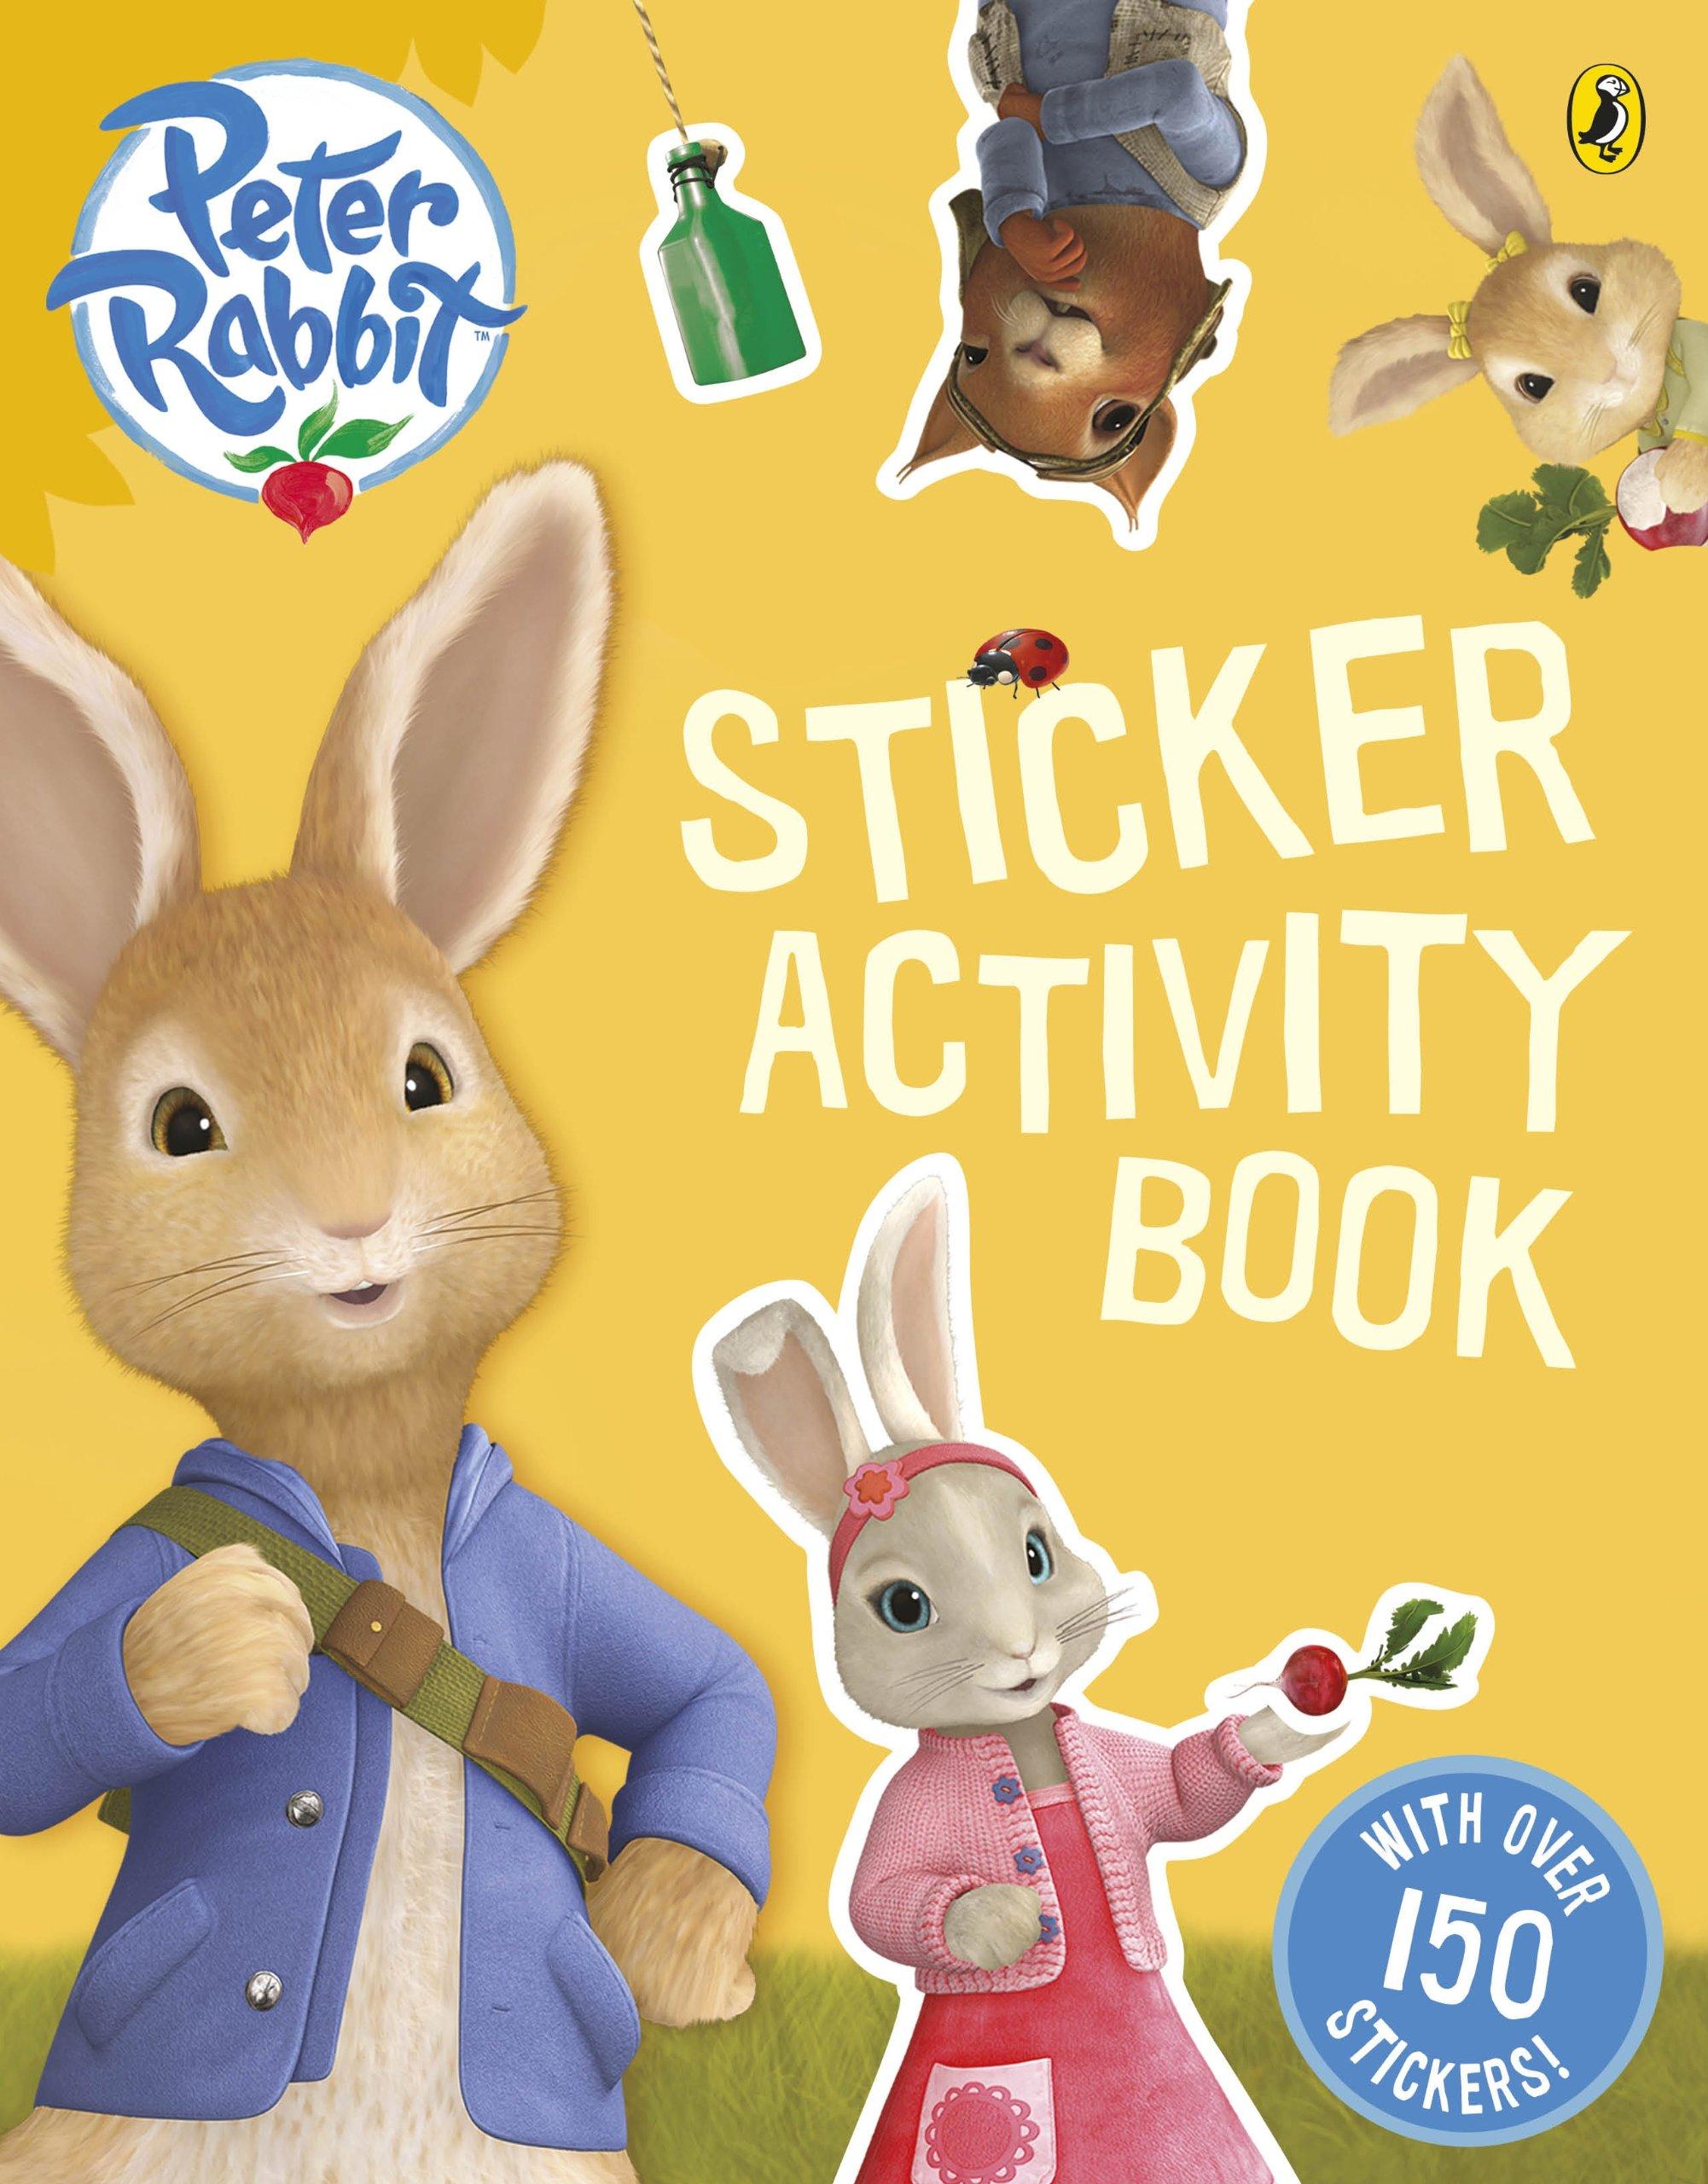 Peter Rabbit Animation: Sticker Activity Book BP Animation